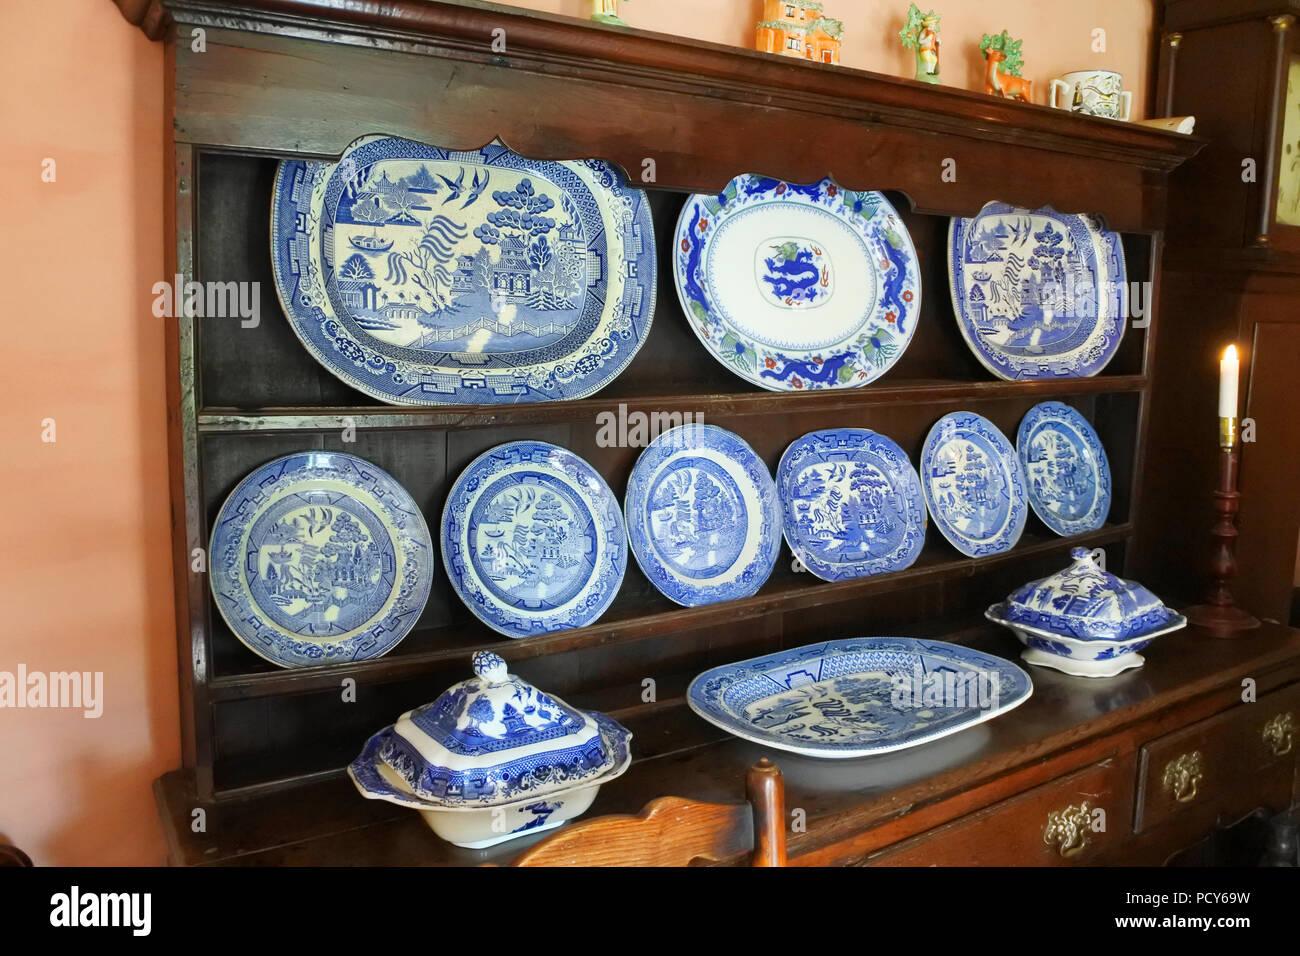 Welsh Dresser And Kitchen Stock Photos & Welsh Dresser And Kitchen ...